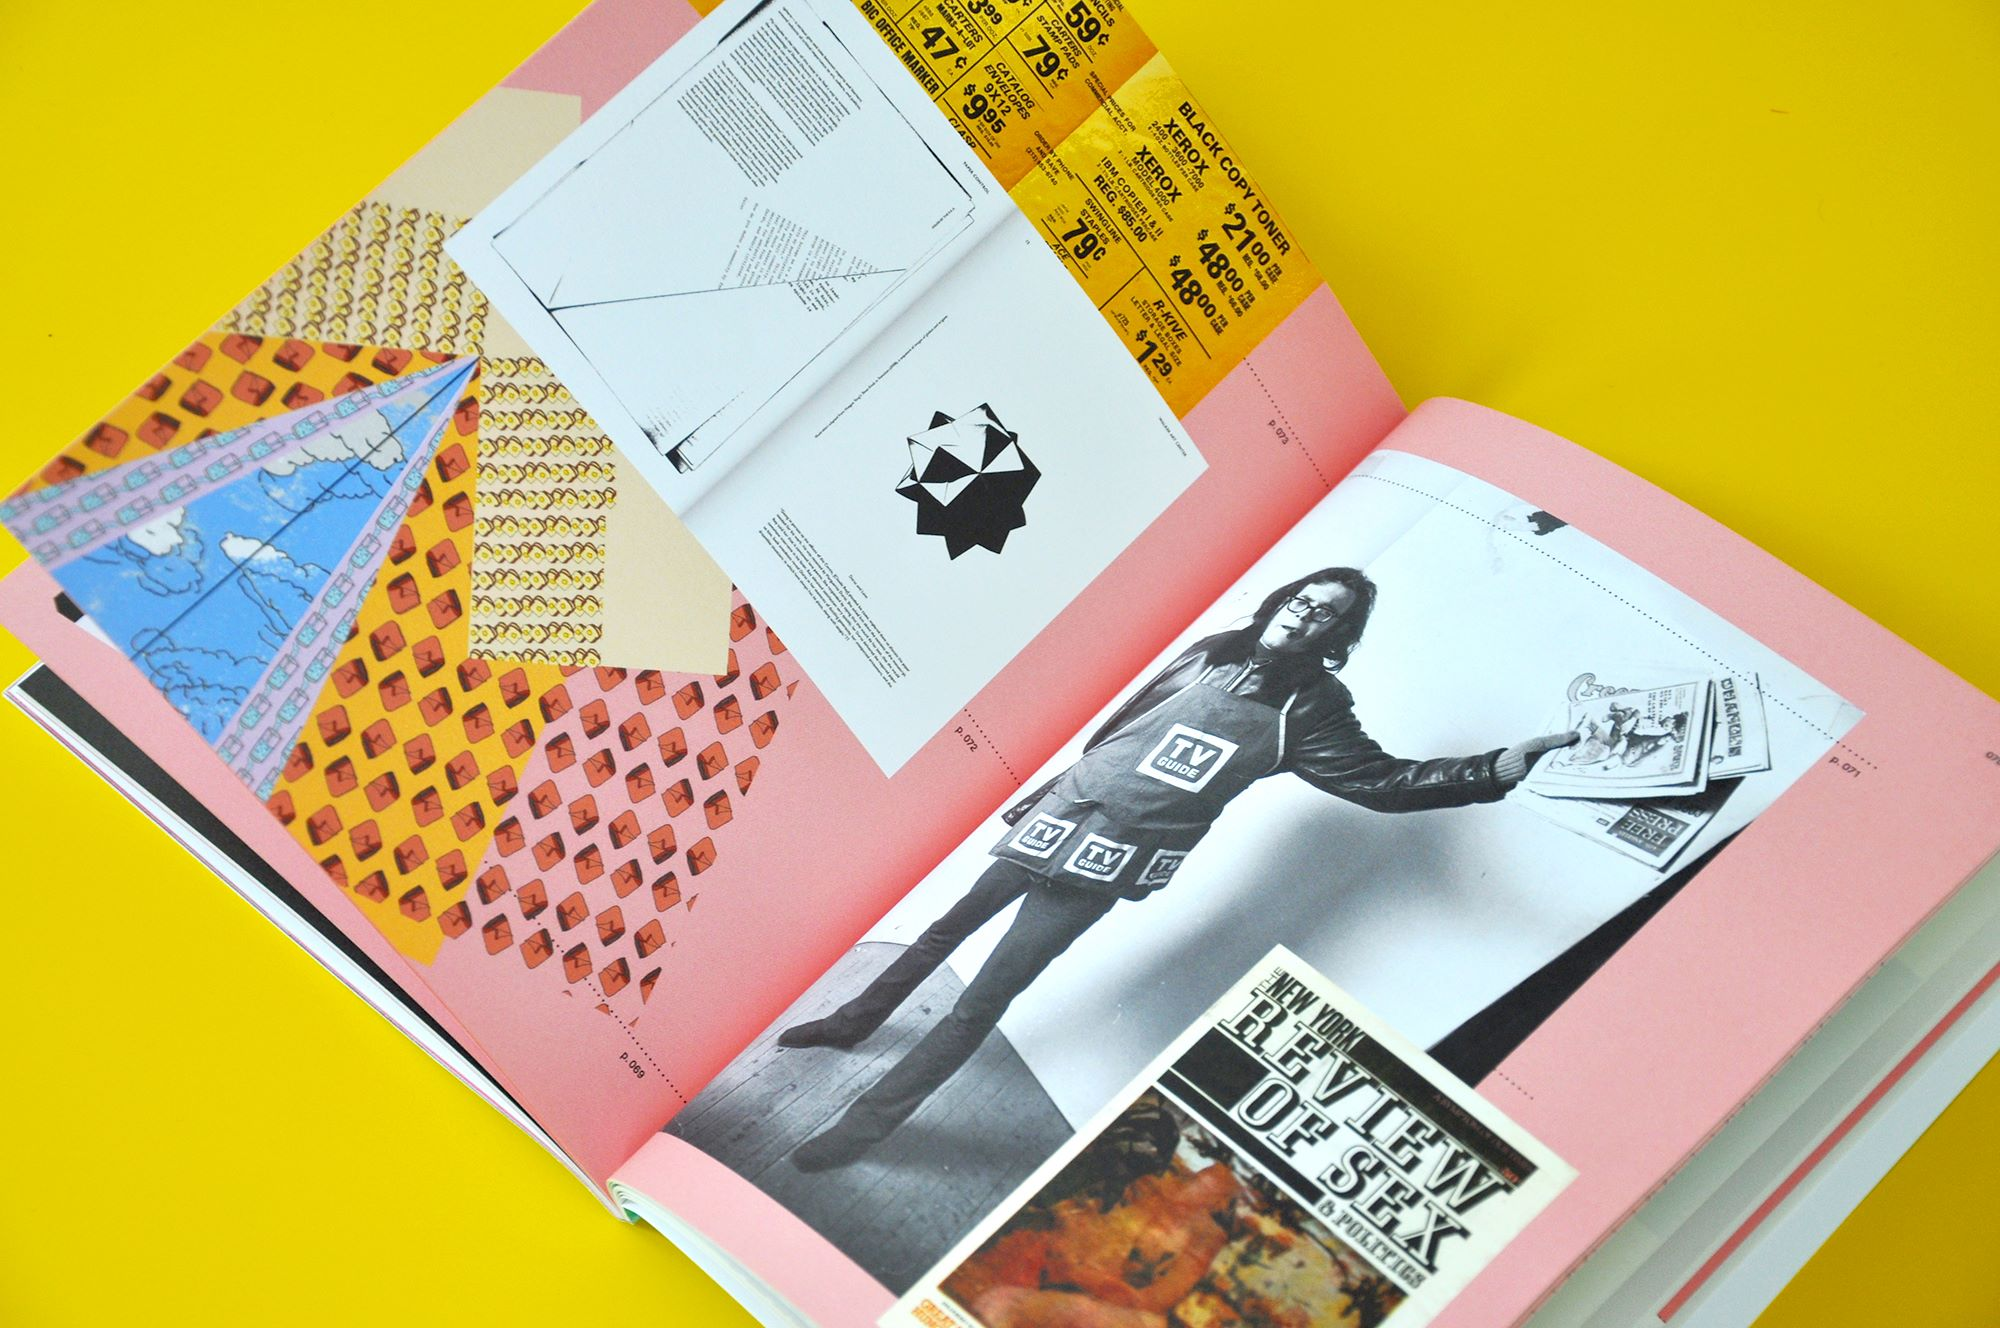 aiga eye on design magazine 9